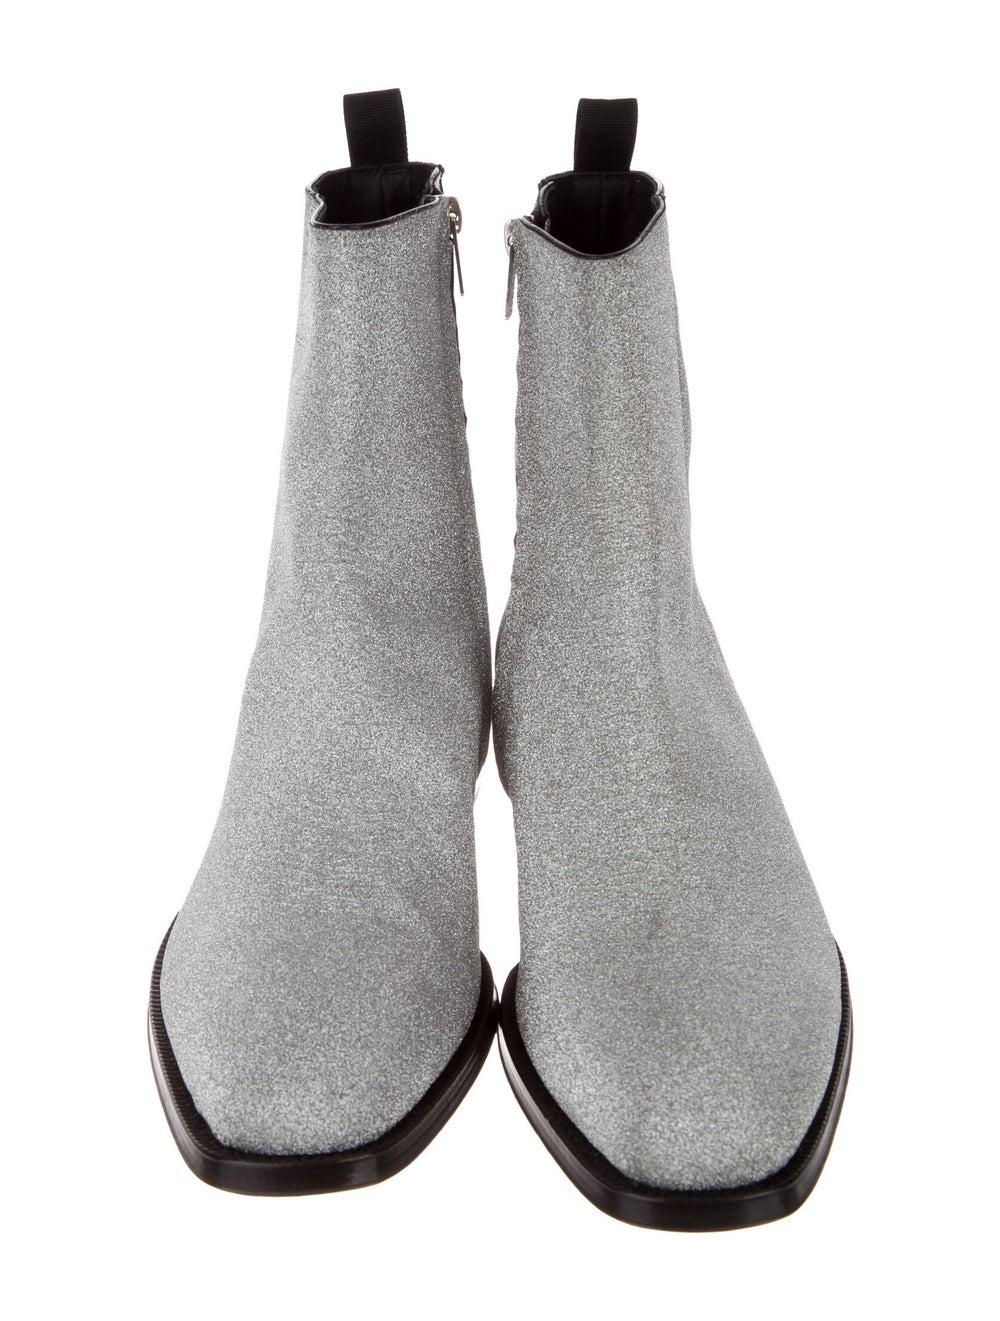 Alexander McQueen Boots Silver - image 3